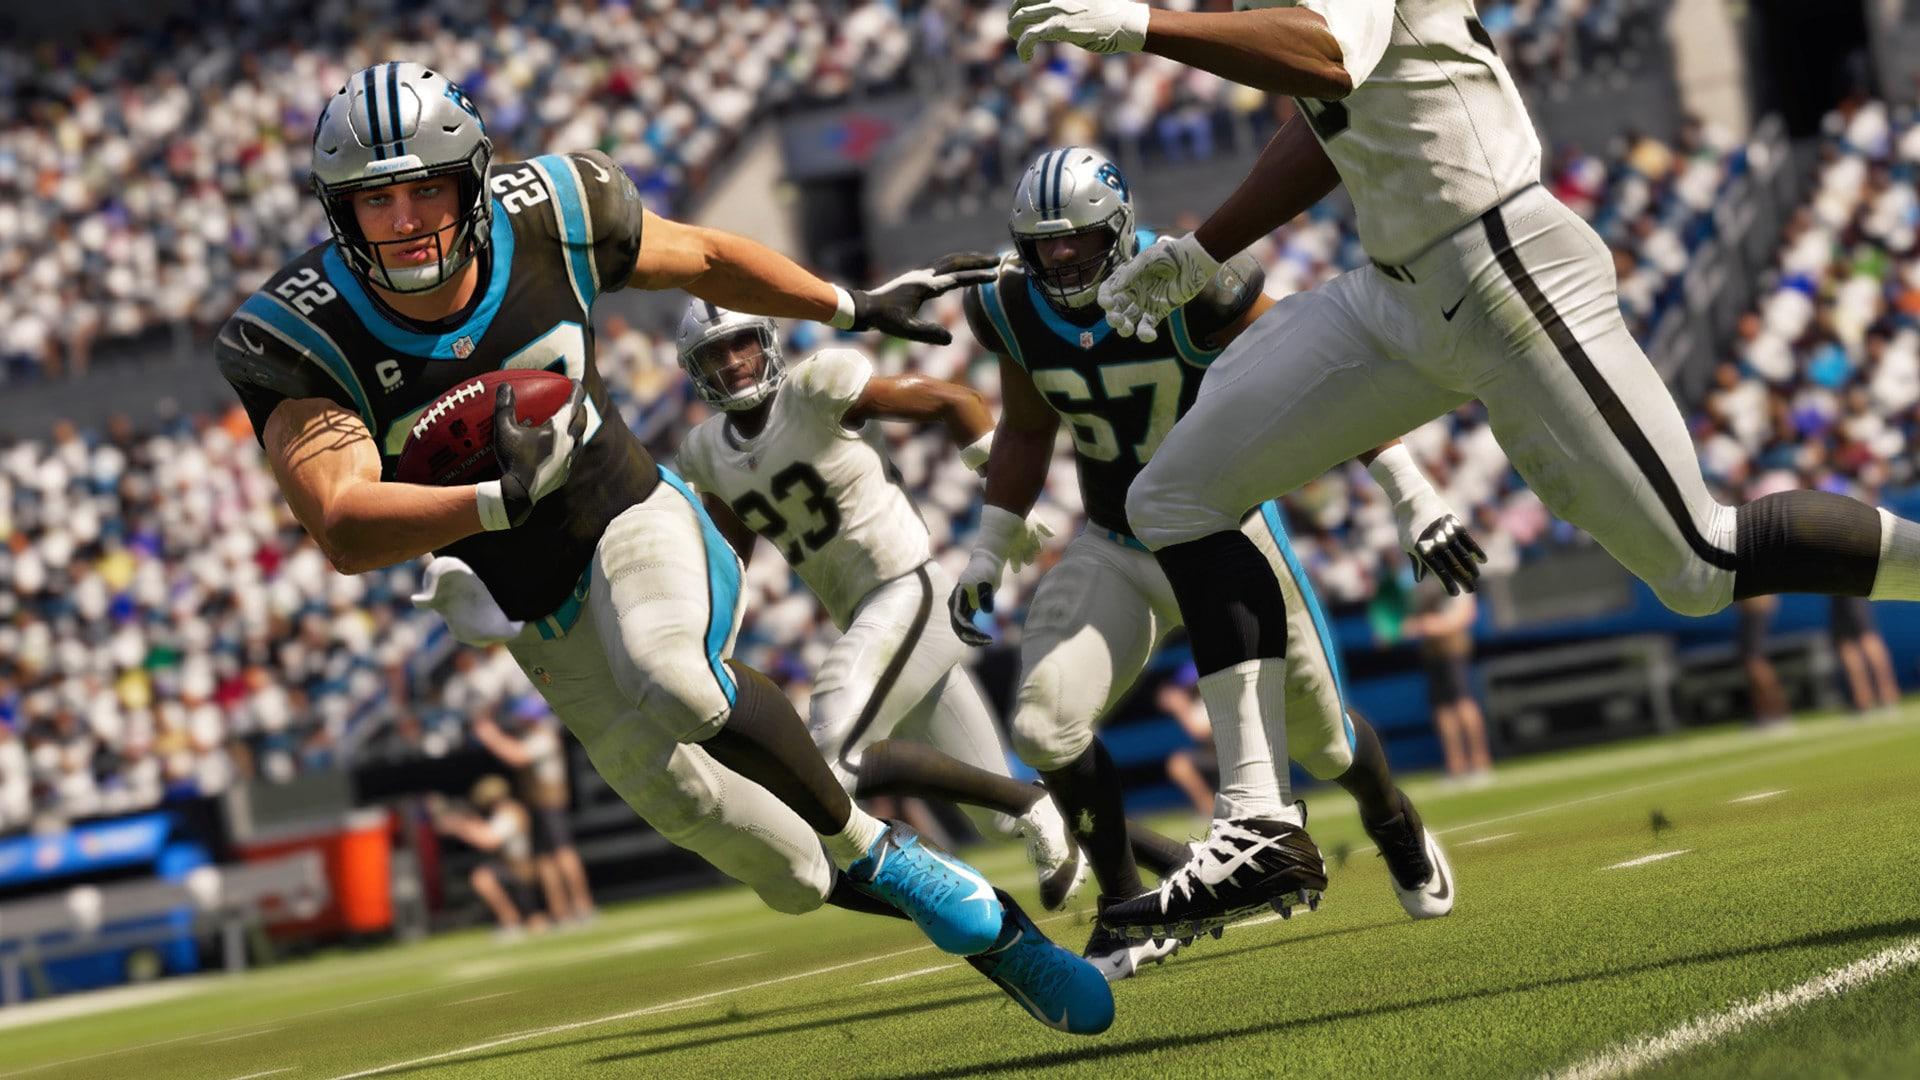 Madden NFL 21 (PC) - Origin Key - GLOBAL - 3